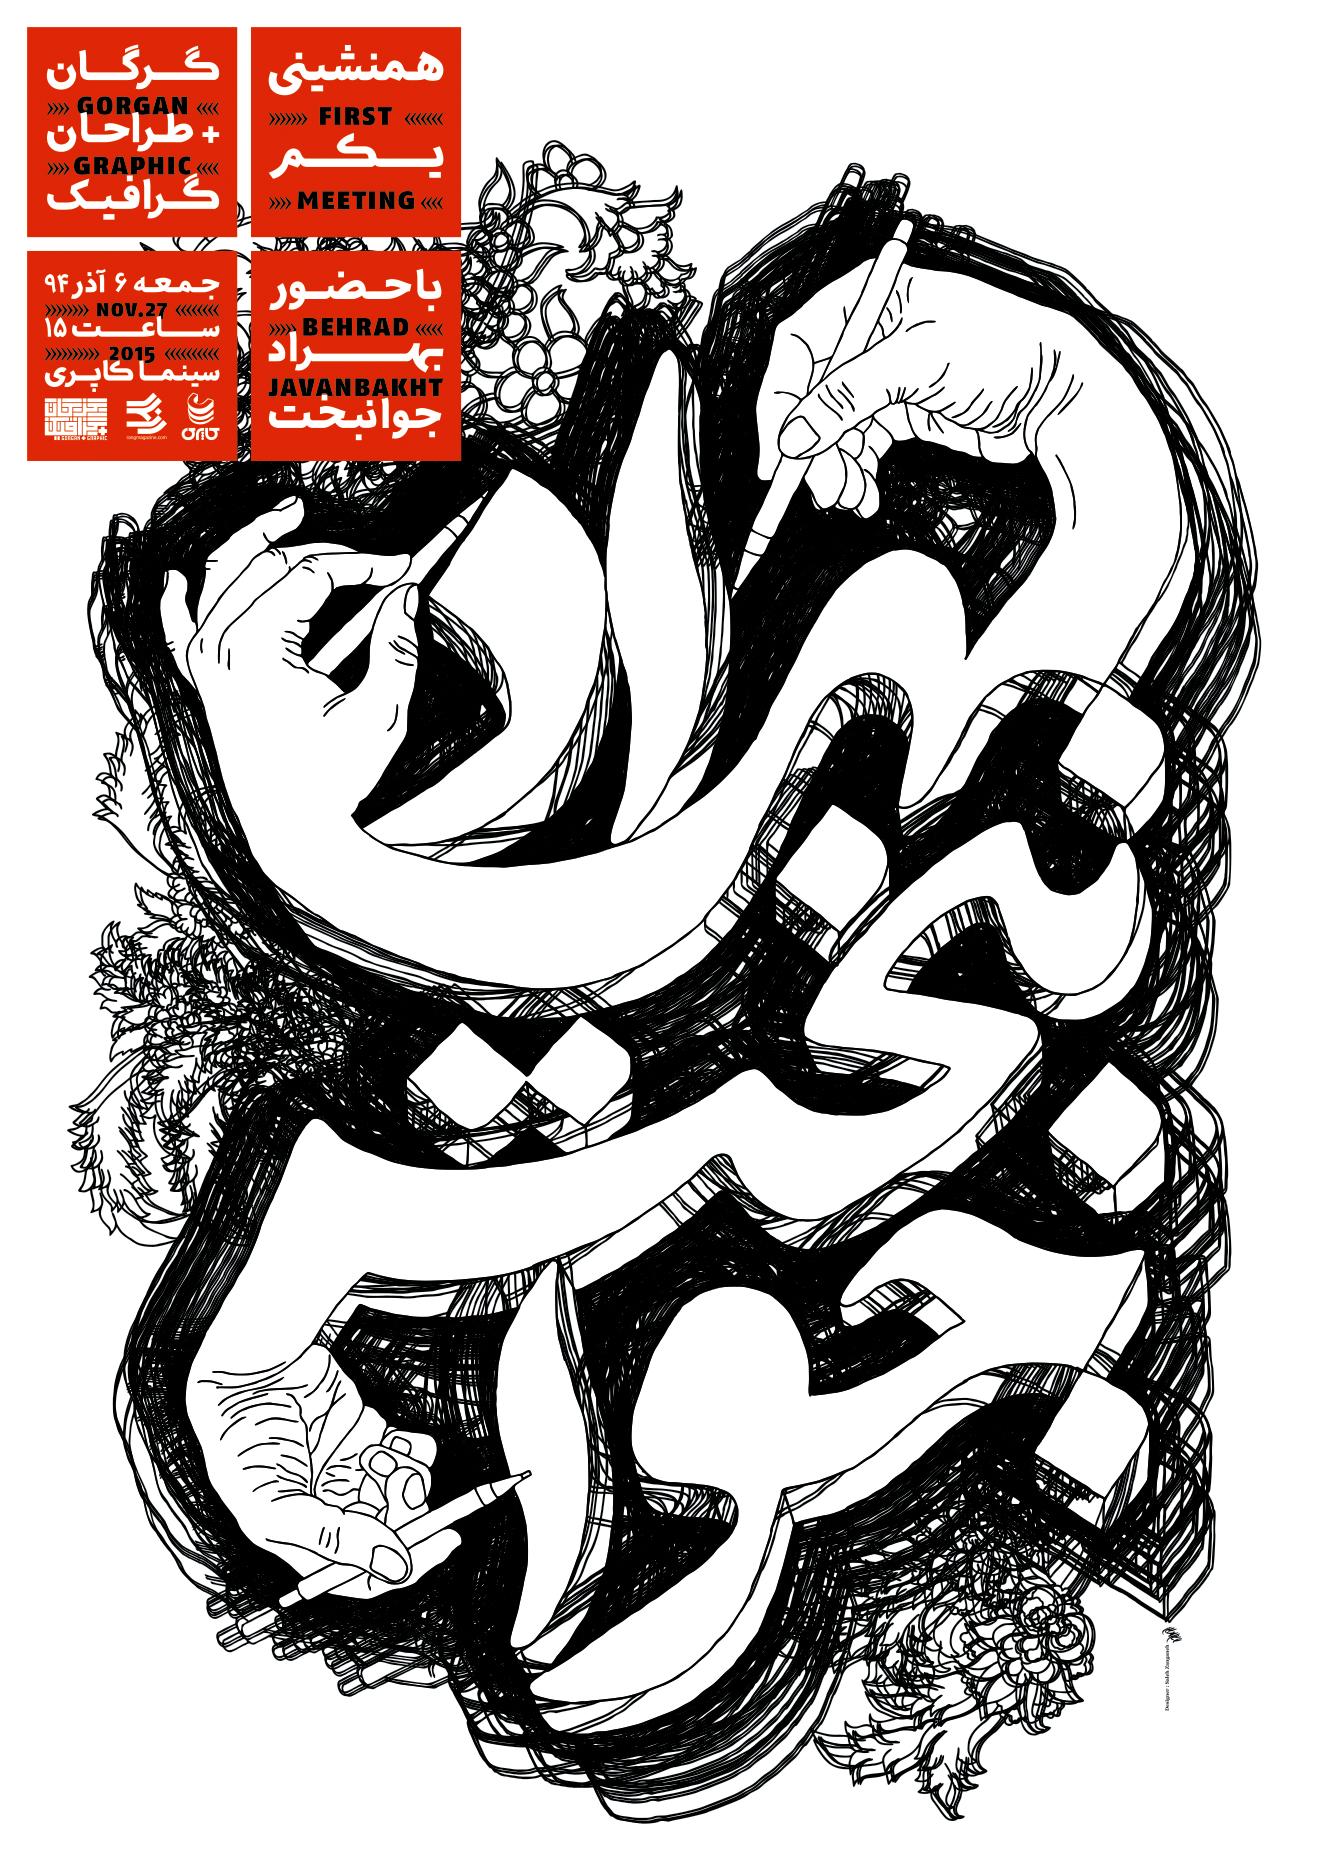 Gorgan+Graphic First Meeting_Poster by Saleh Zanganeh